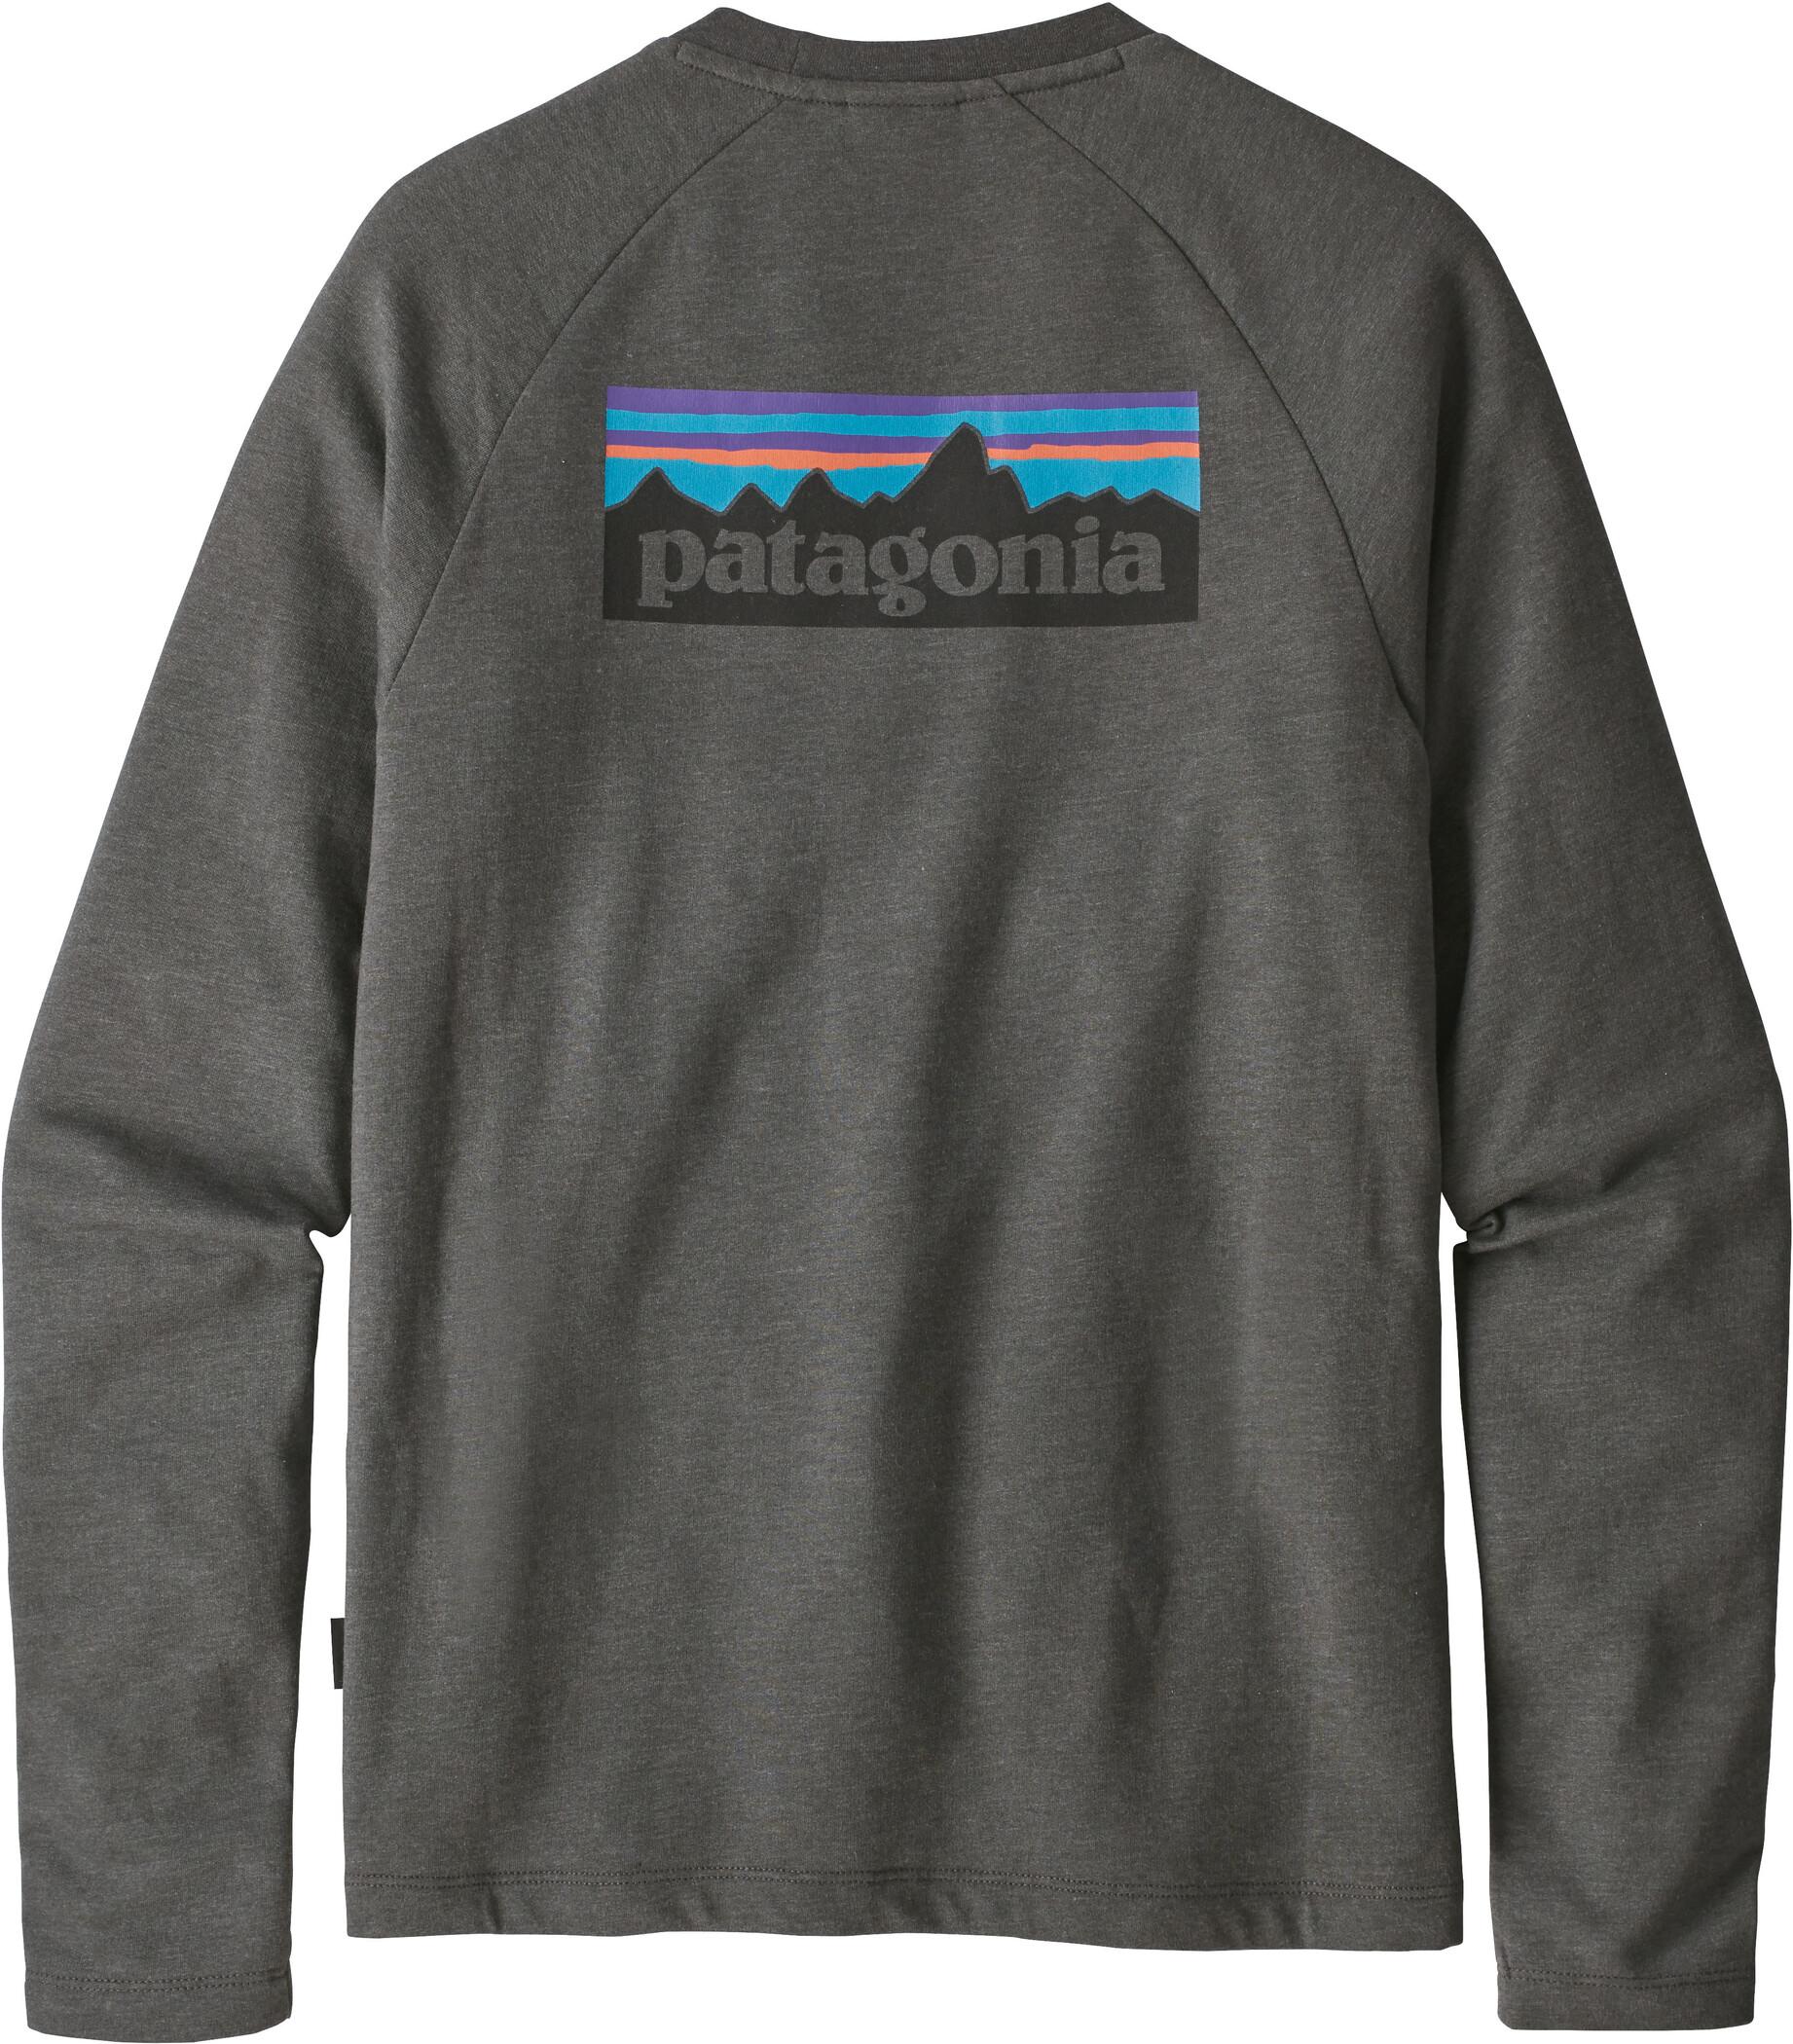 Patagonia P 6 Label Lightweight Crew Sweatshirt Herr forge grey